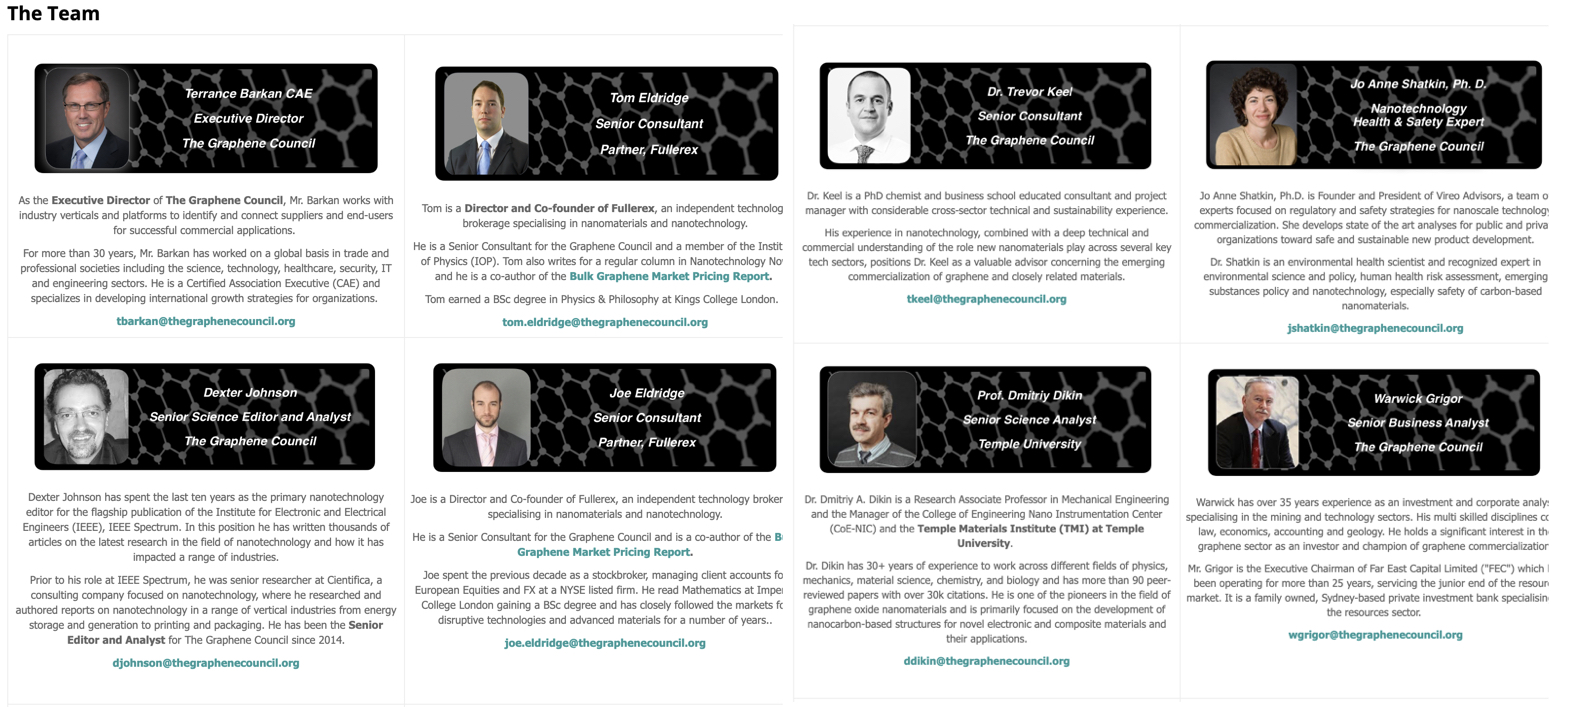 Graphene Updates - The Graphene Council